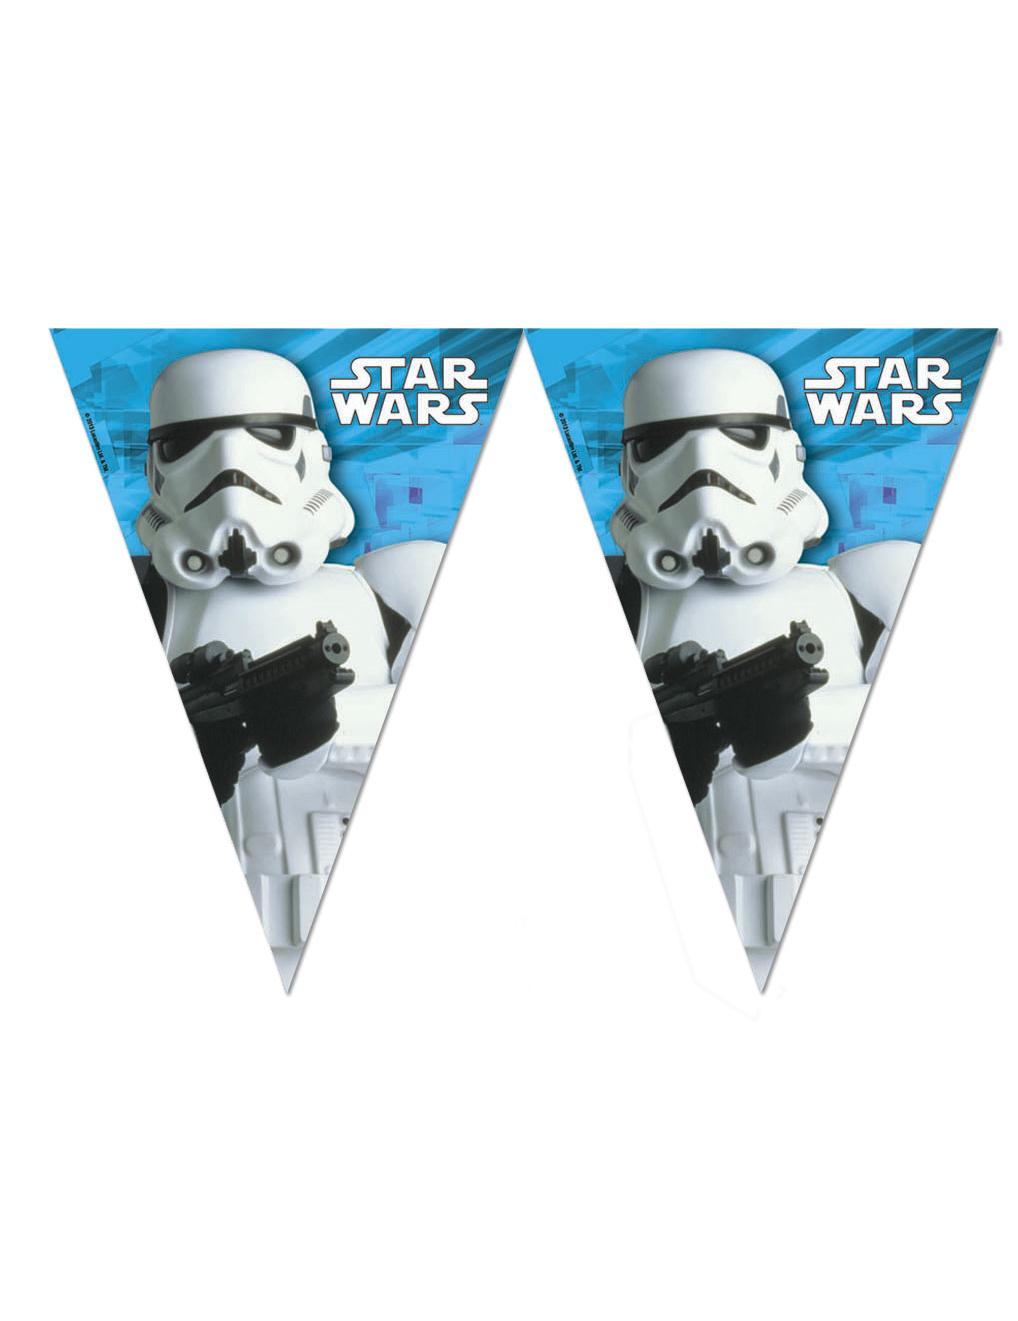 guirlande fanions stormtrooper star wars d coration anniversaire et f tes th me sur vegaoo party. Black Bedroom Furniture Sets. Home Design Ideas